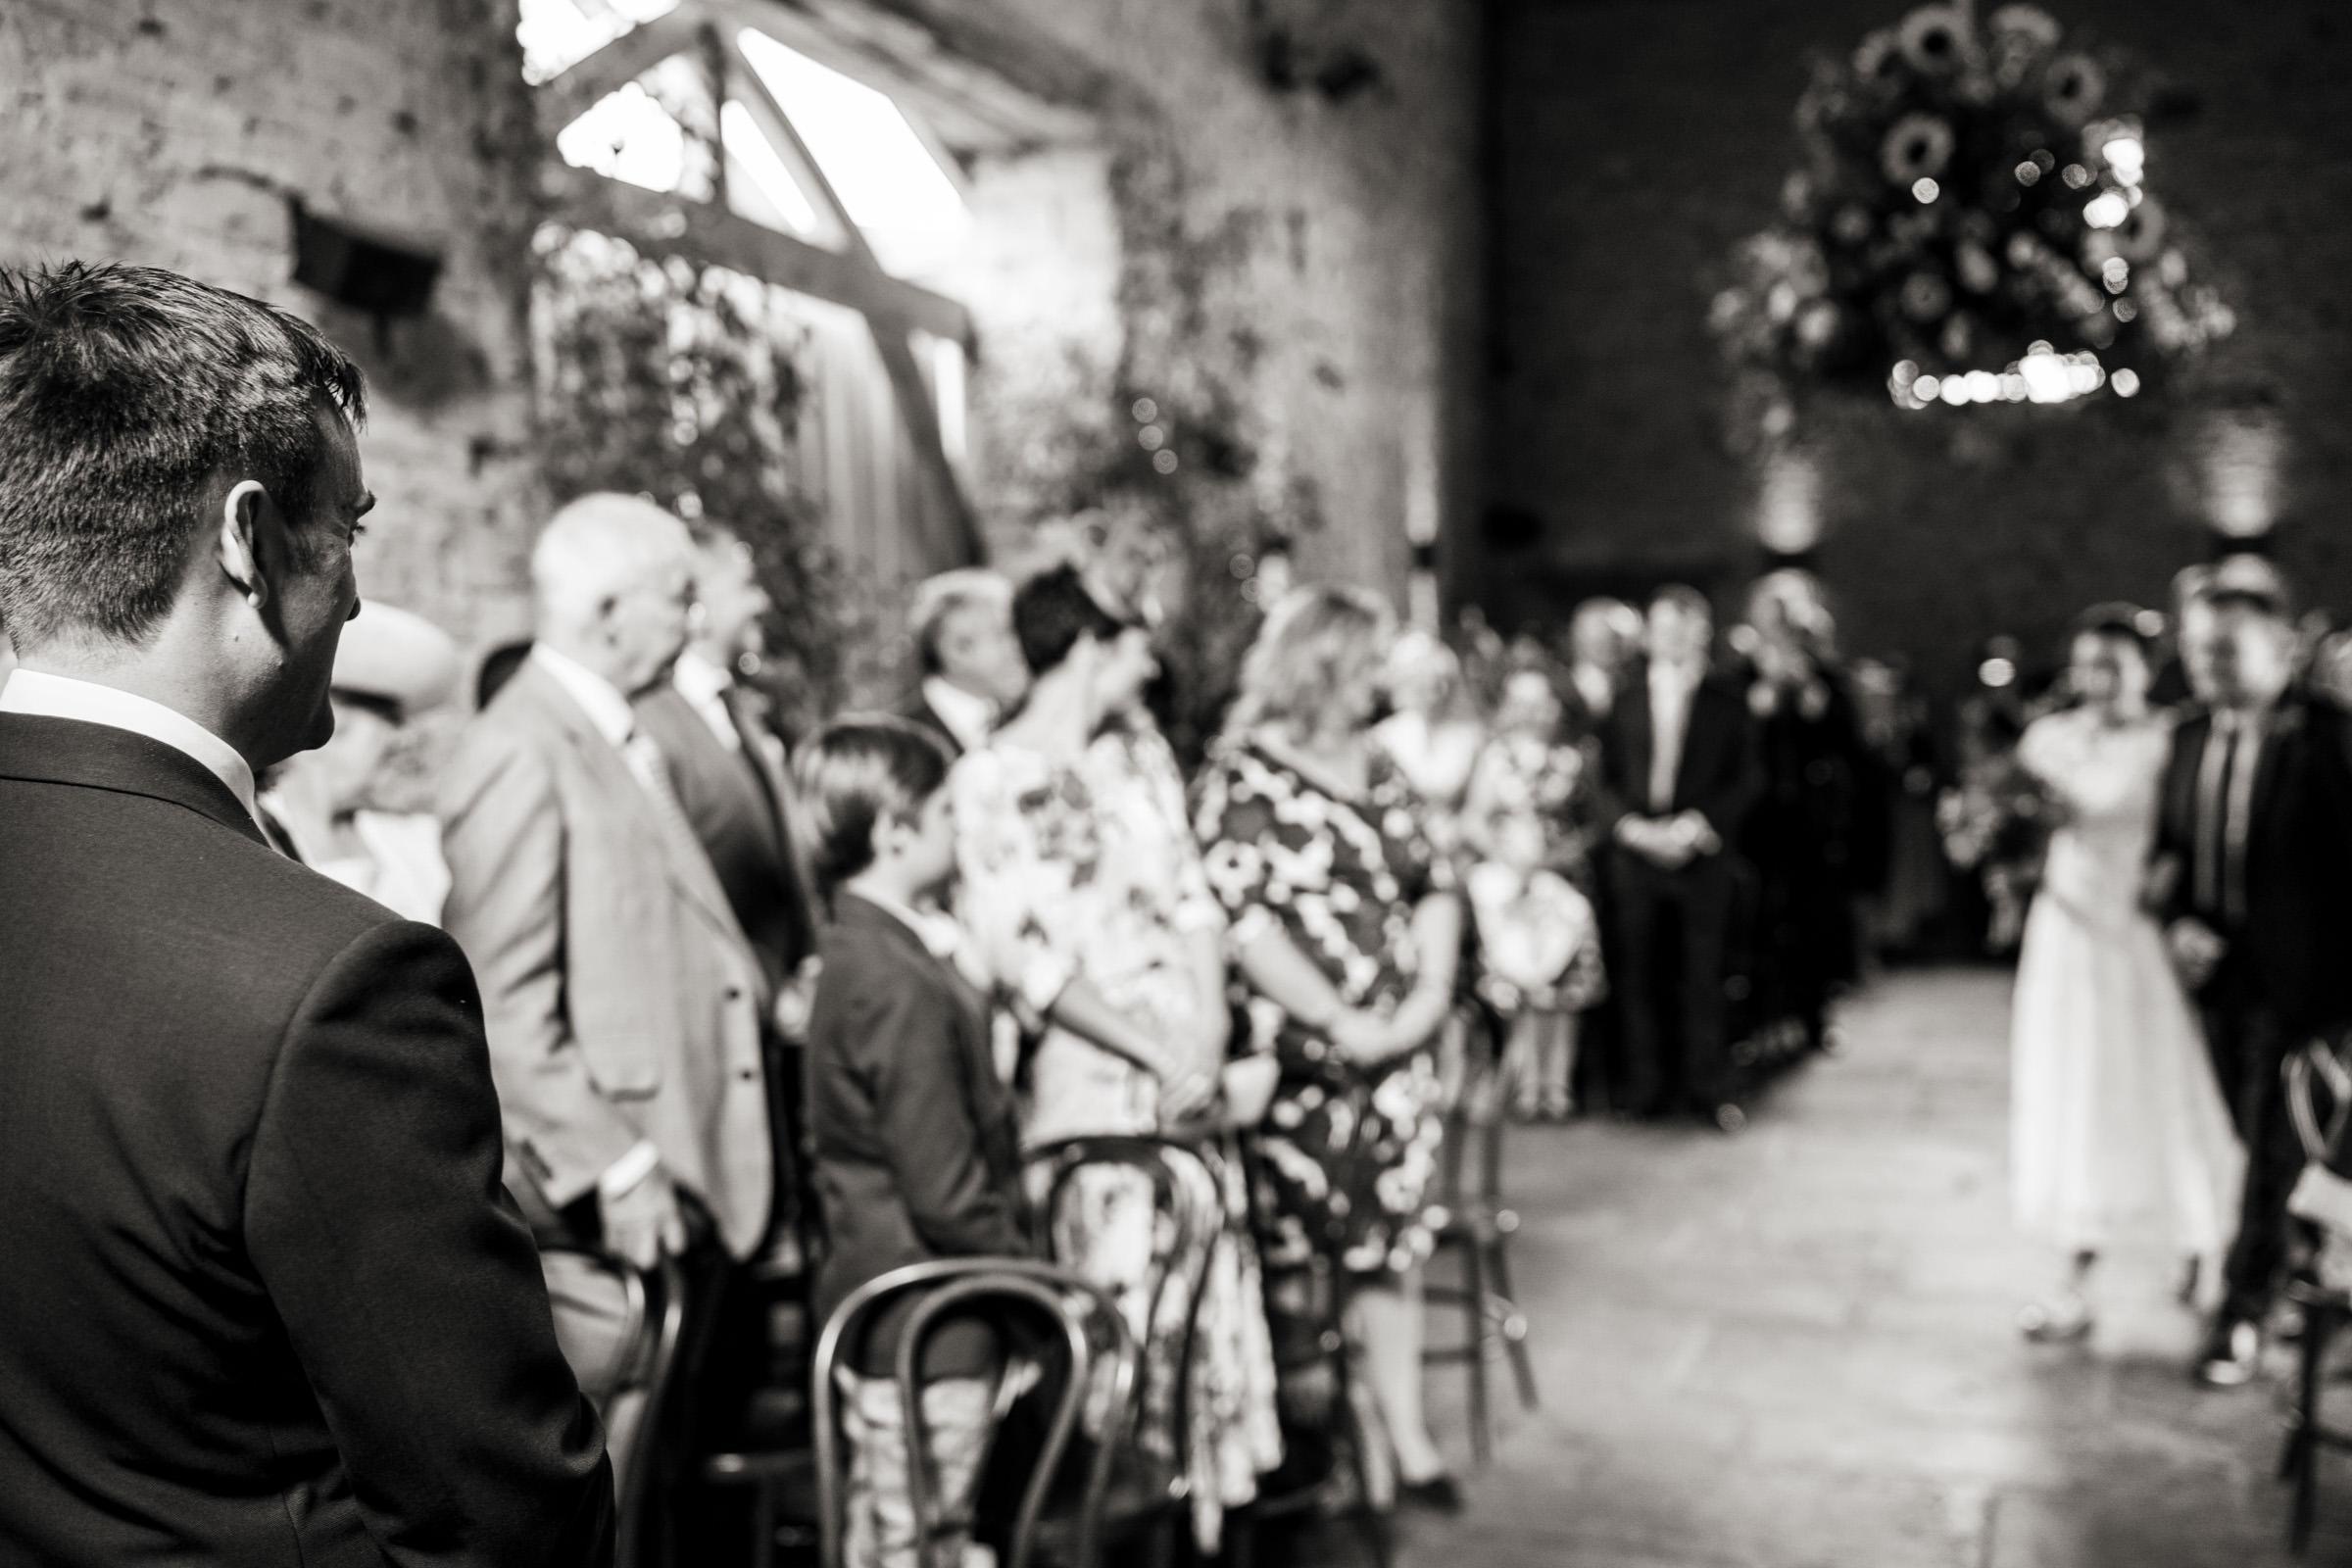 Cripps Barn Bibury Cotswolds Wedding Photography 009.jpg